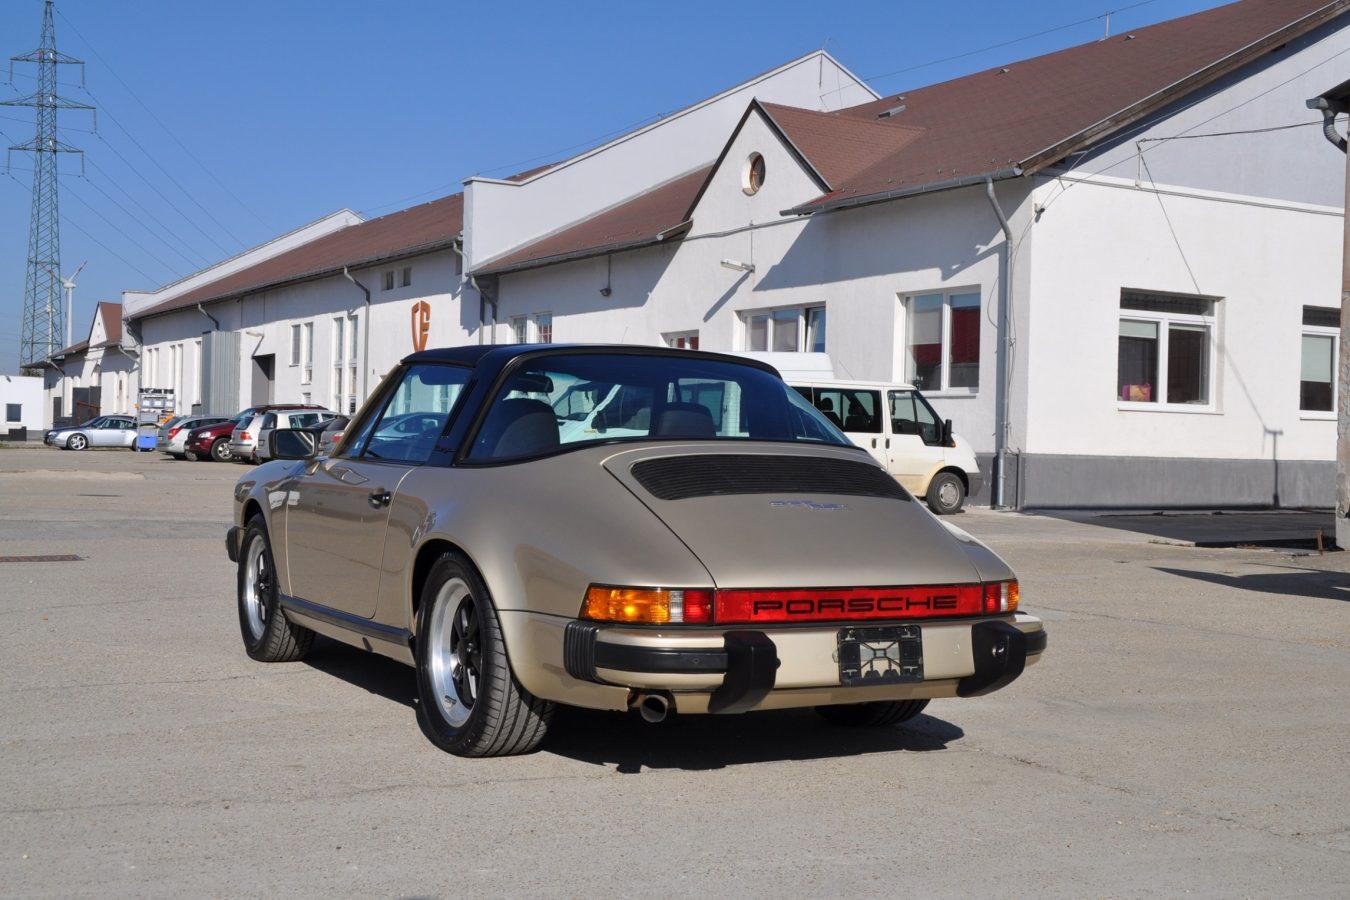 Youngtimer Porsche in Hellbronze Metallic 5